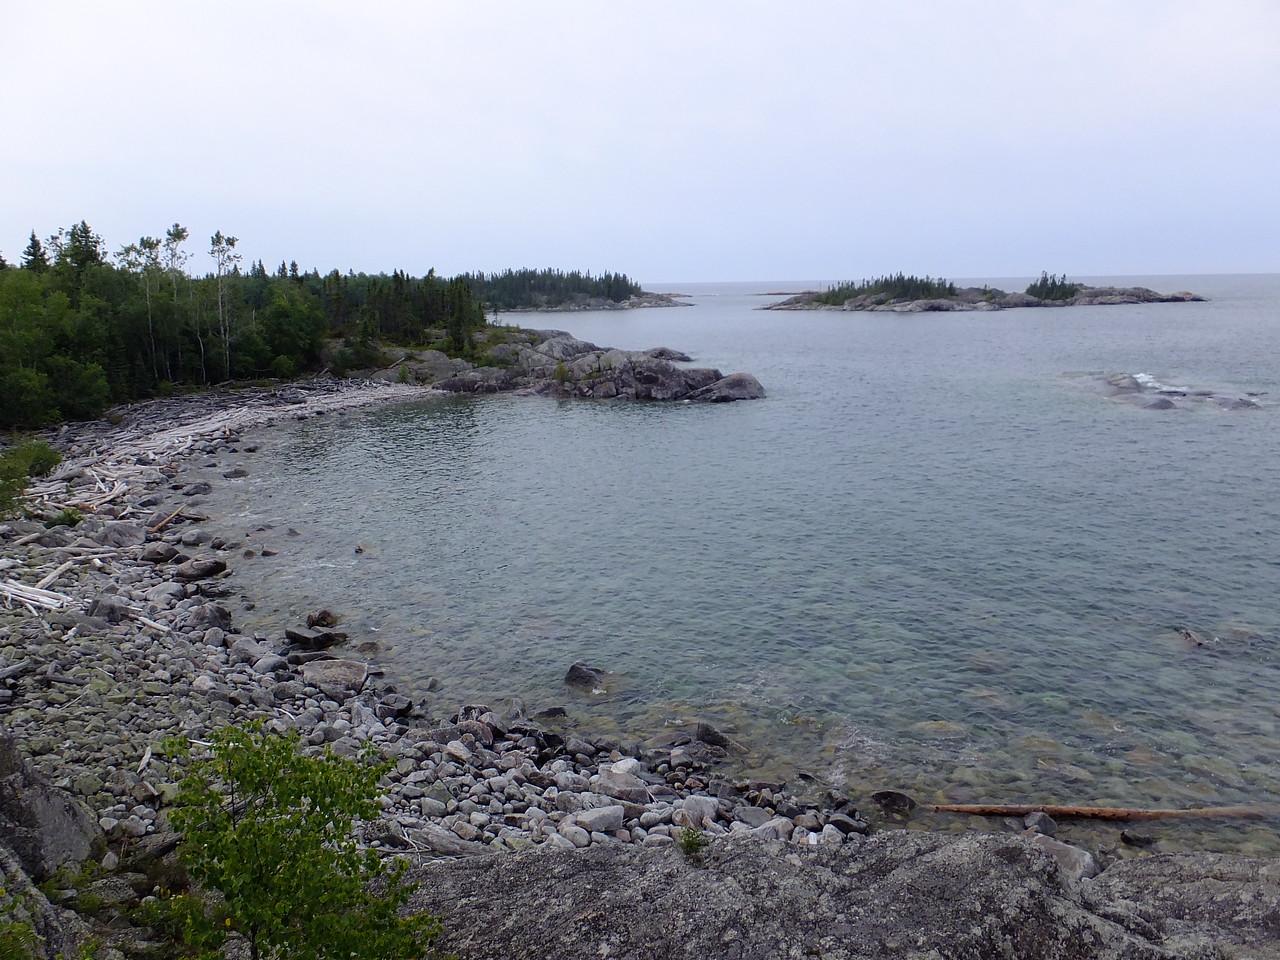 Typical coastline